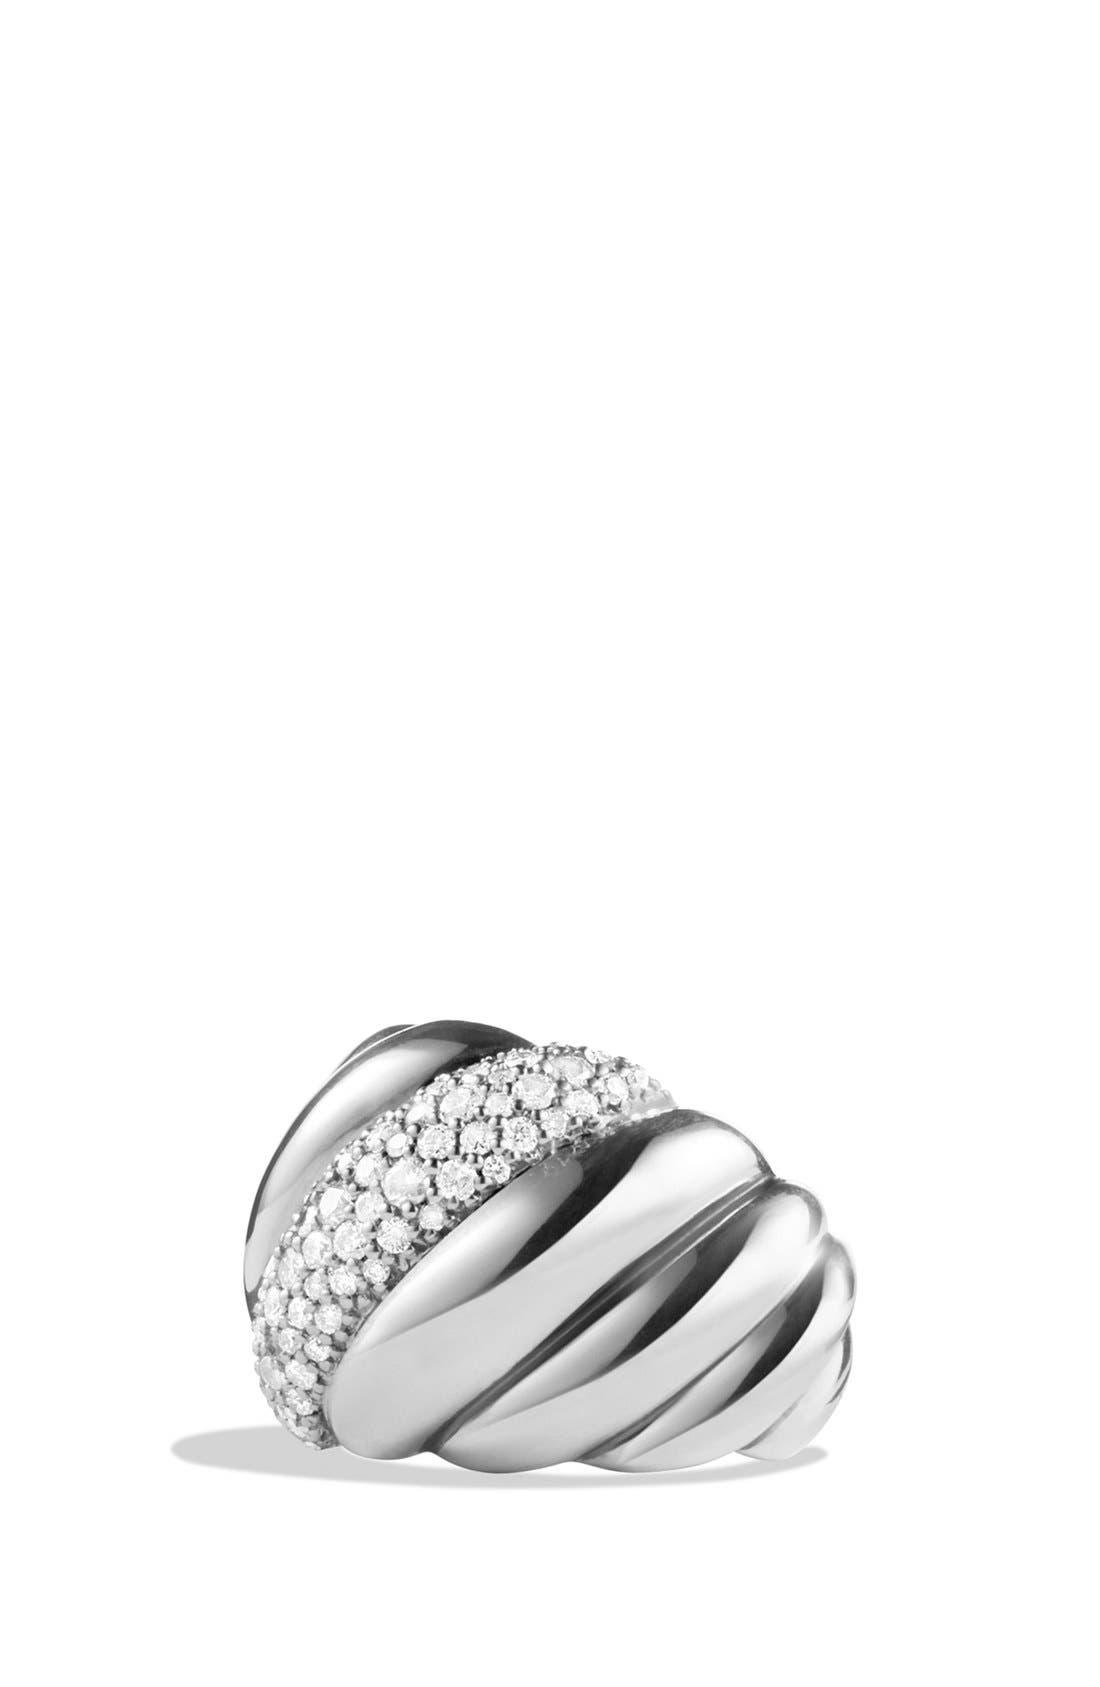 Main Image - David Yurman 'Hampton Cable' Ring with Diamonds